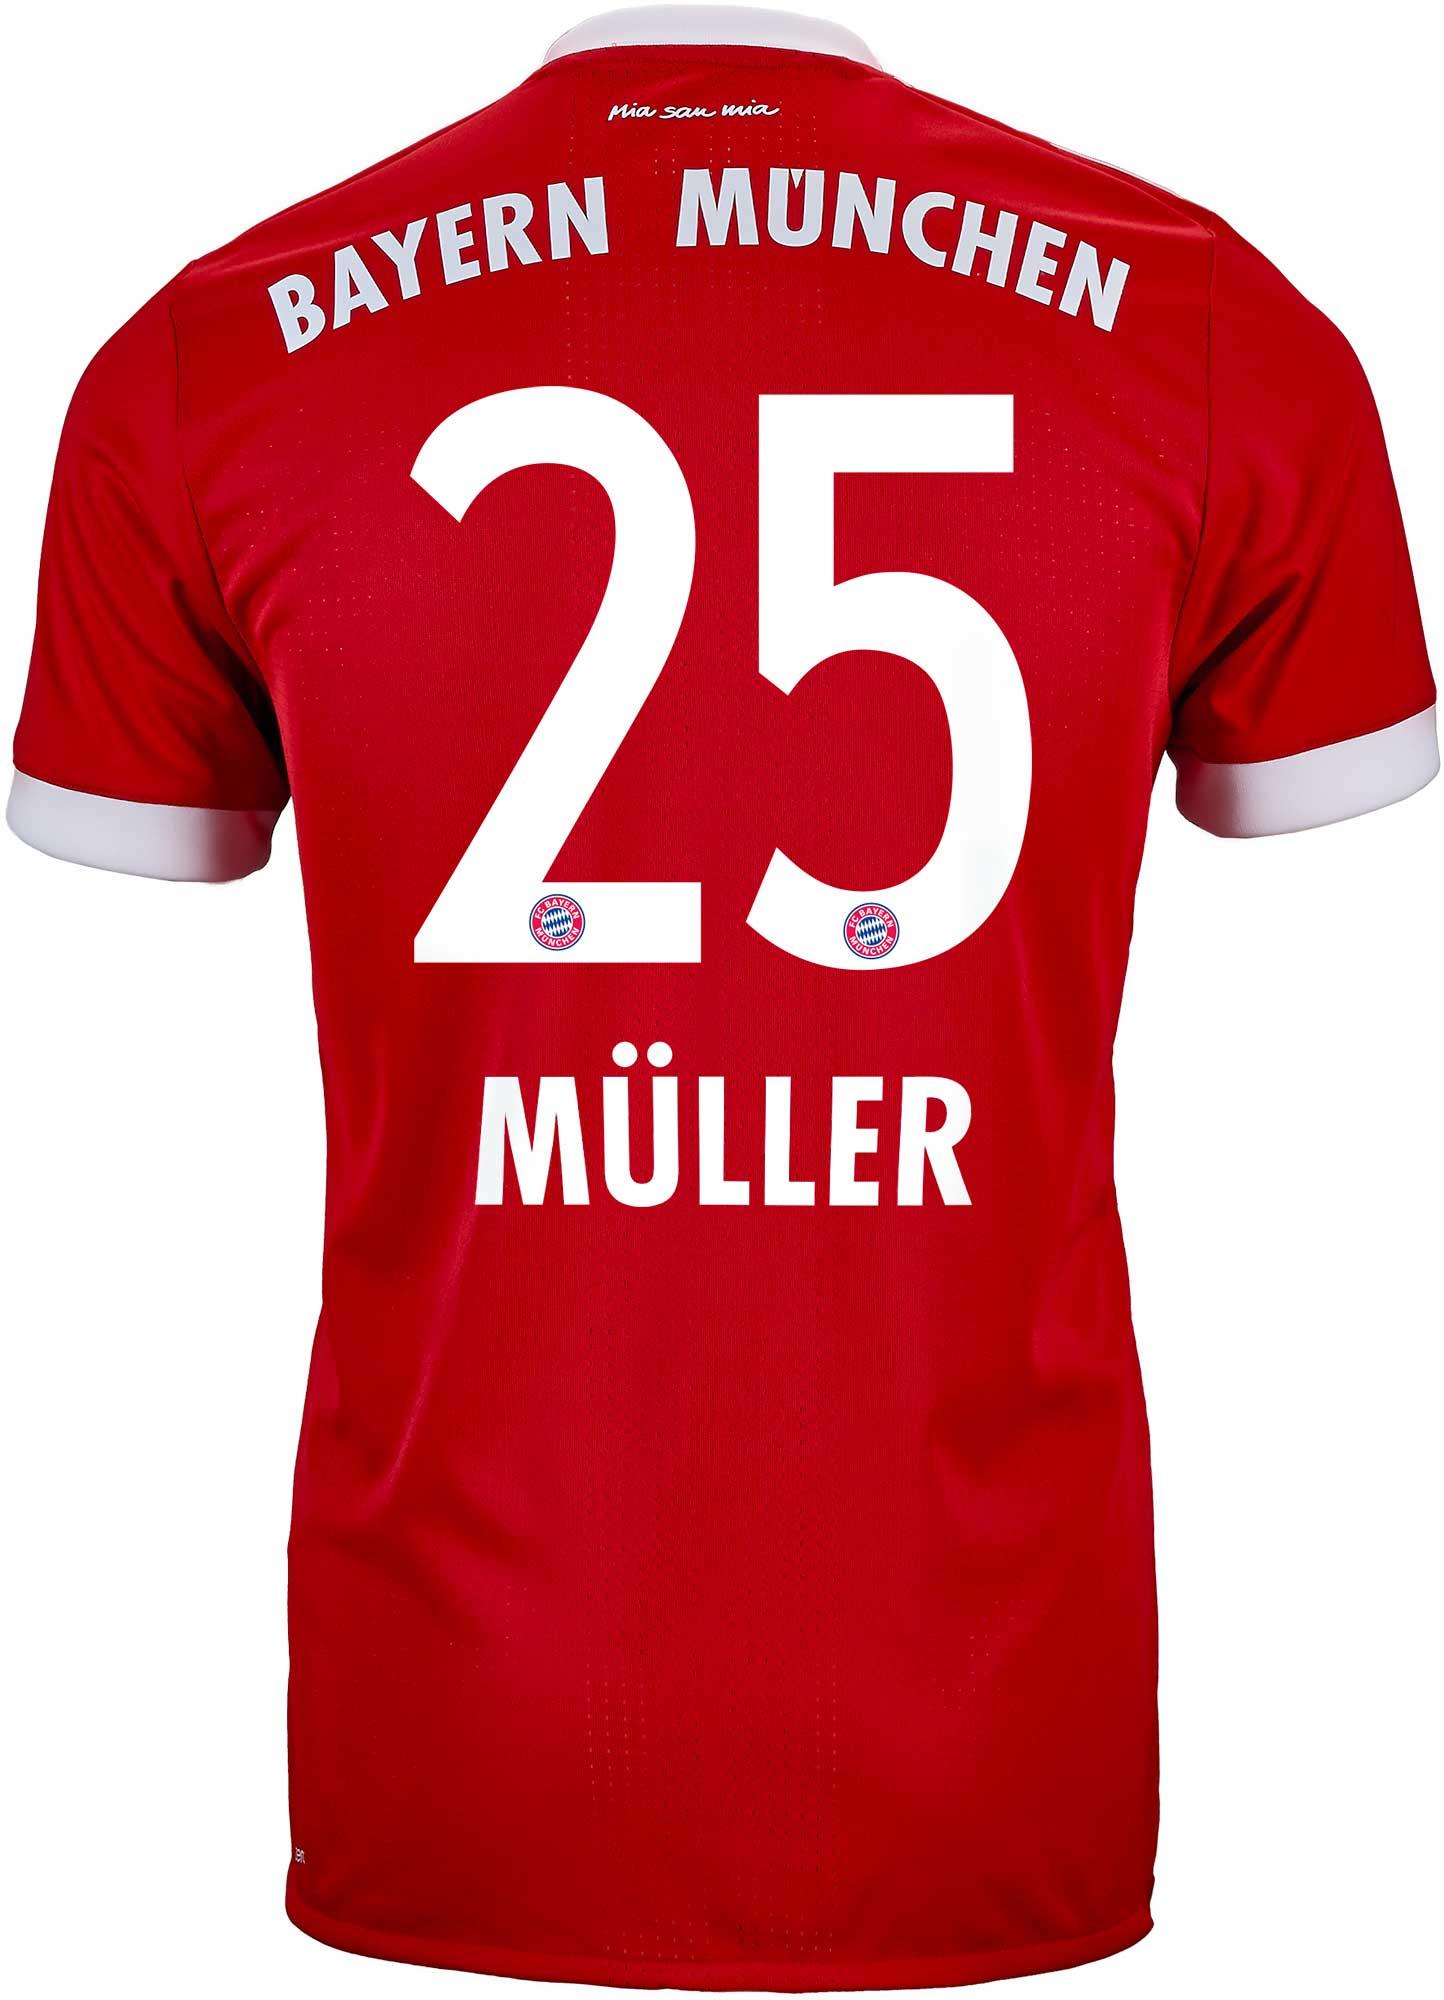 Official Thomas Muller Jersey | World Soccer Shop